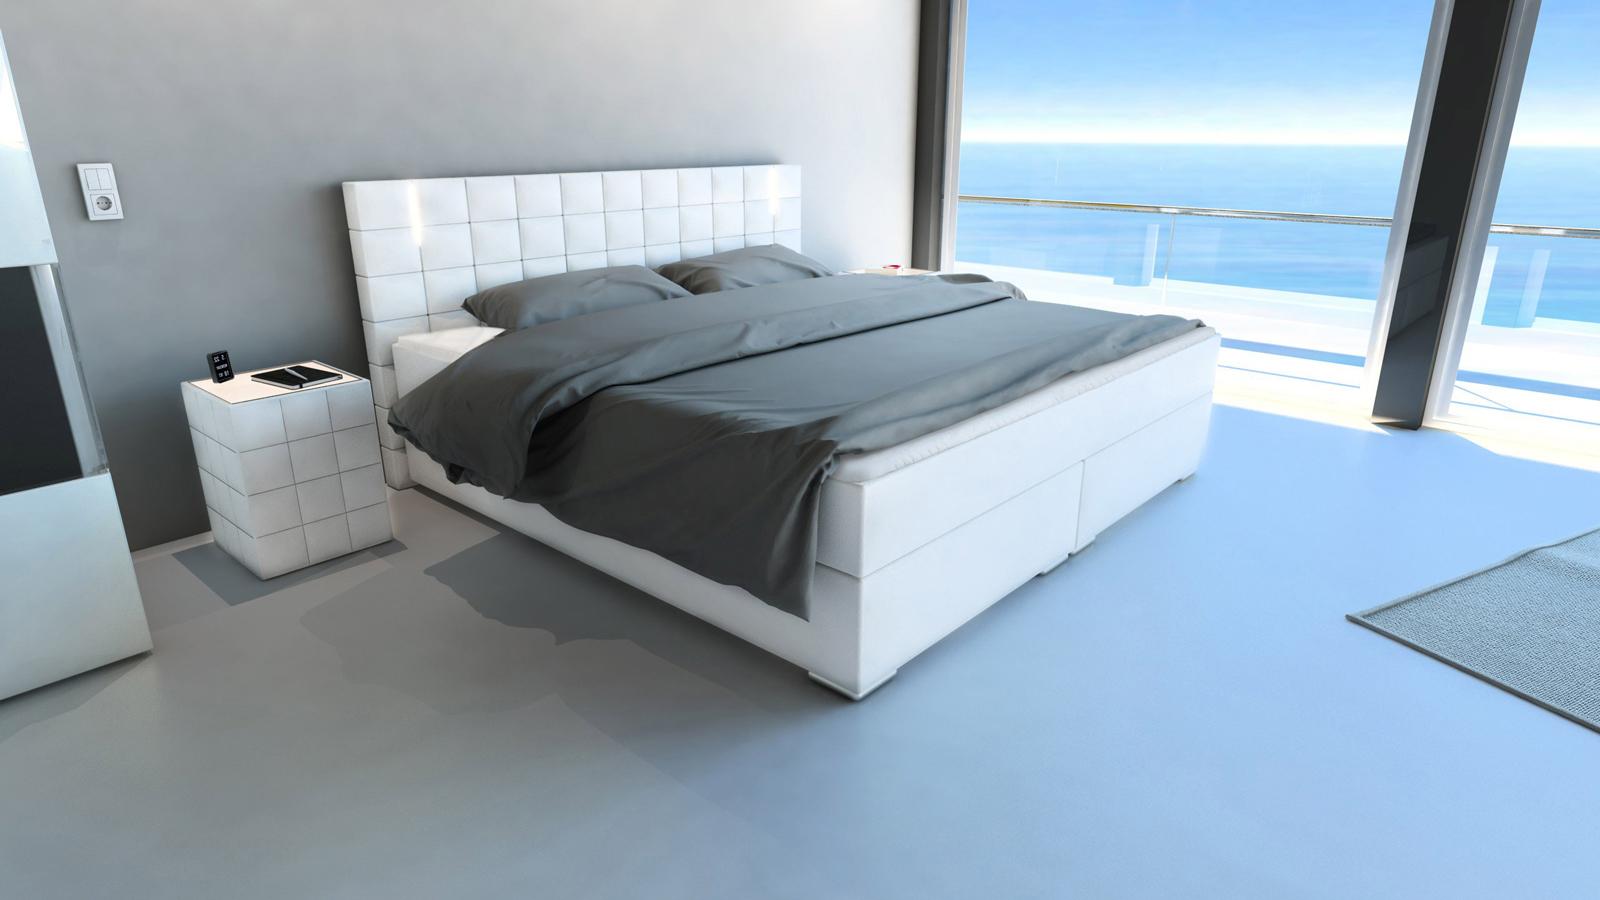 sam boxspringbett hotelbett led beleuchtung 180x200 cm wei boston demn chst. Black Bedroom Furniture Sets. Home Design Ideas